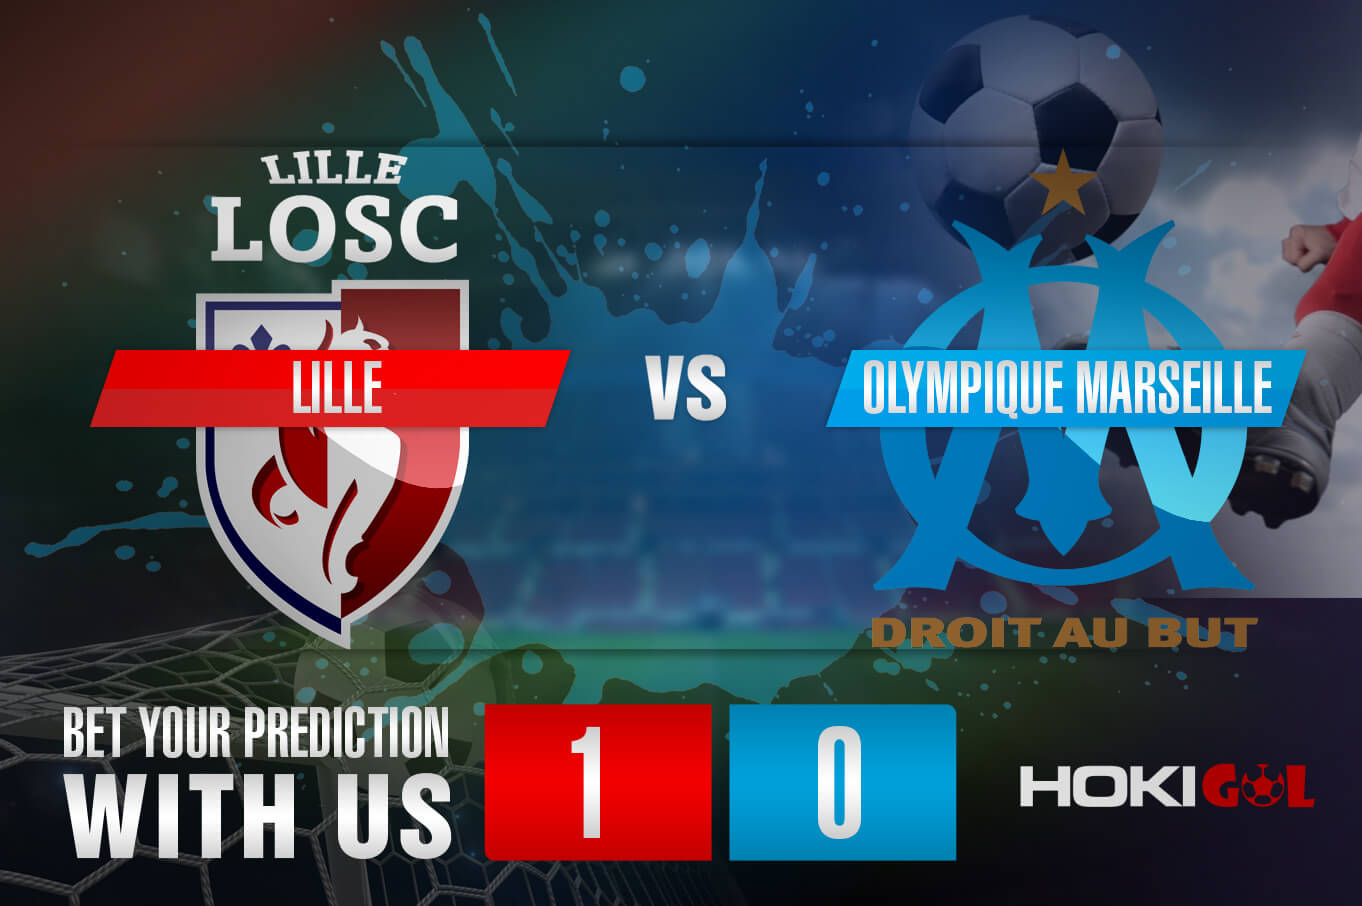 Prediksi Bola Lille Vs Olympique Marseille 4 Maret 2021